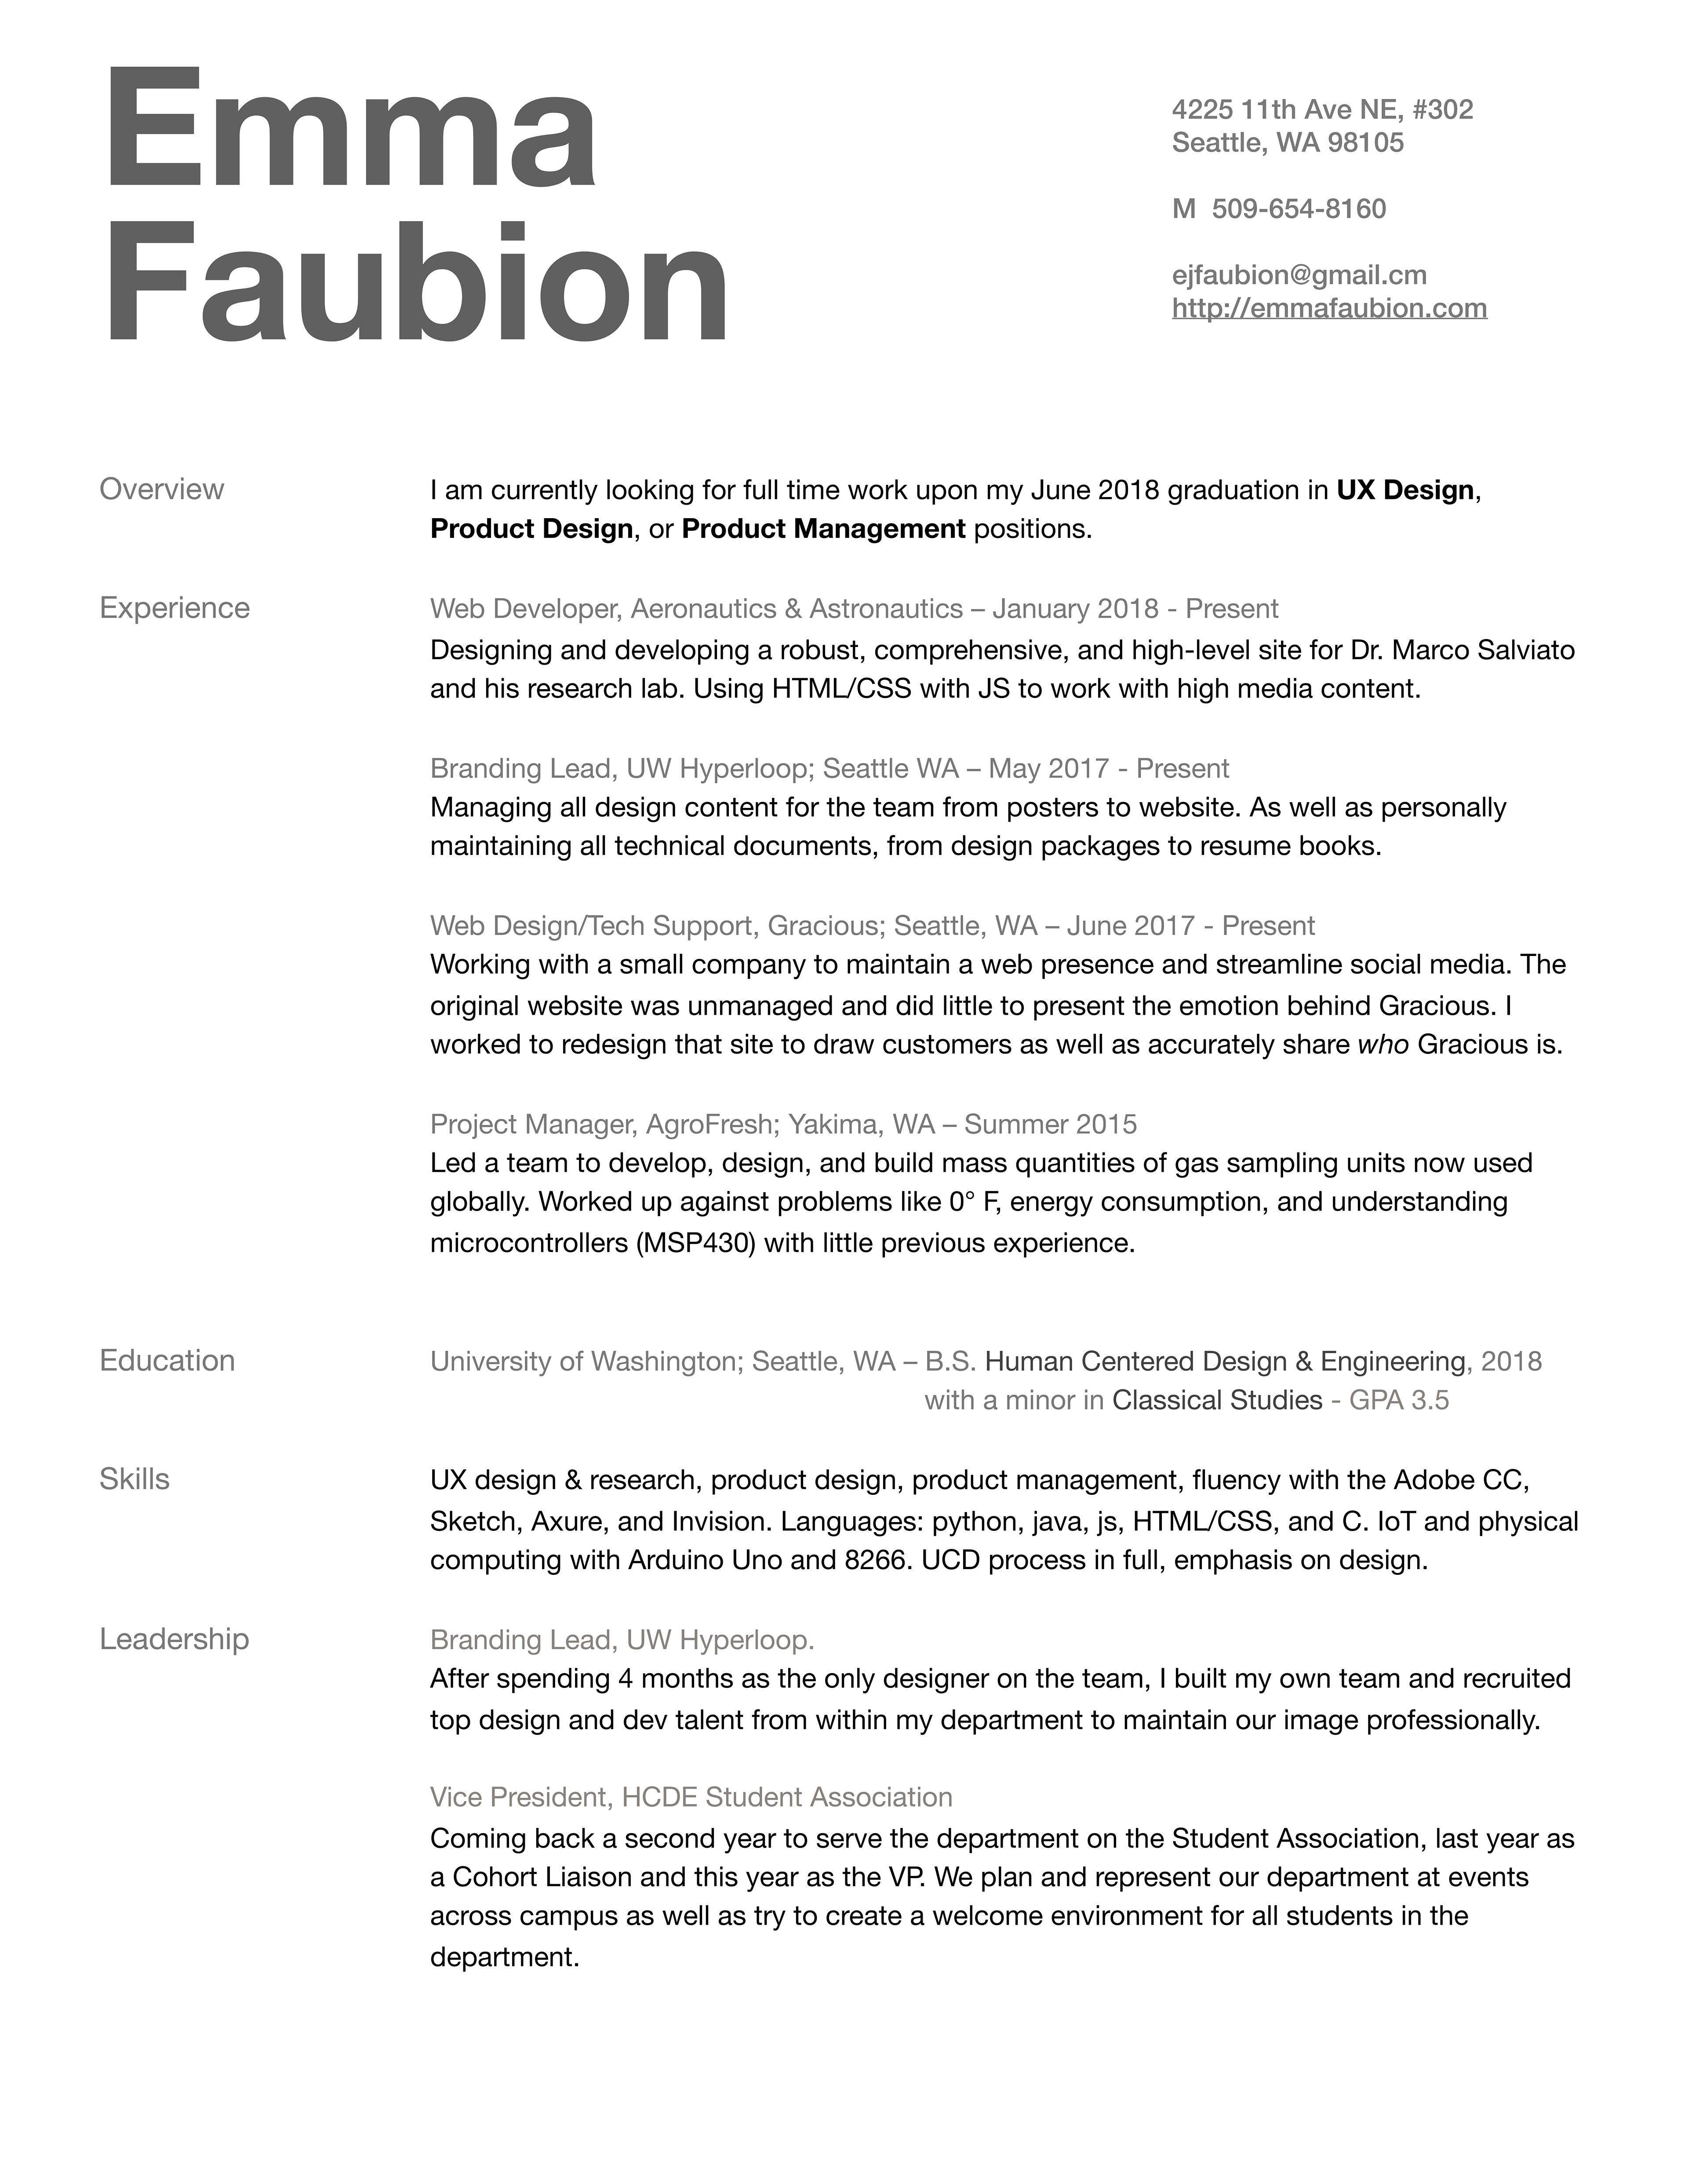 Emma Faubion Resume